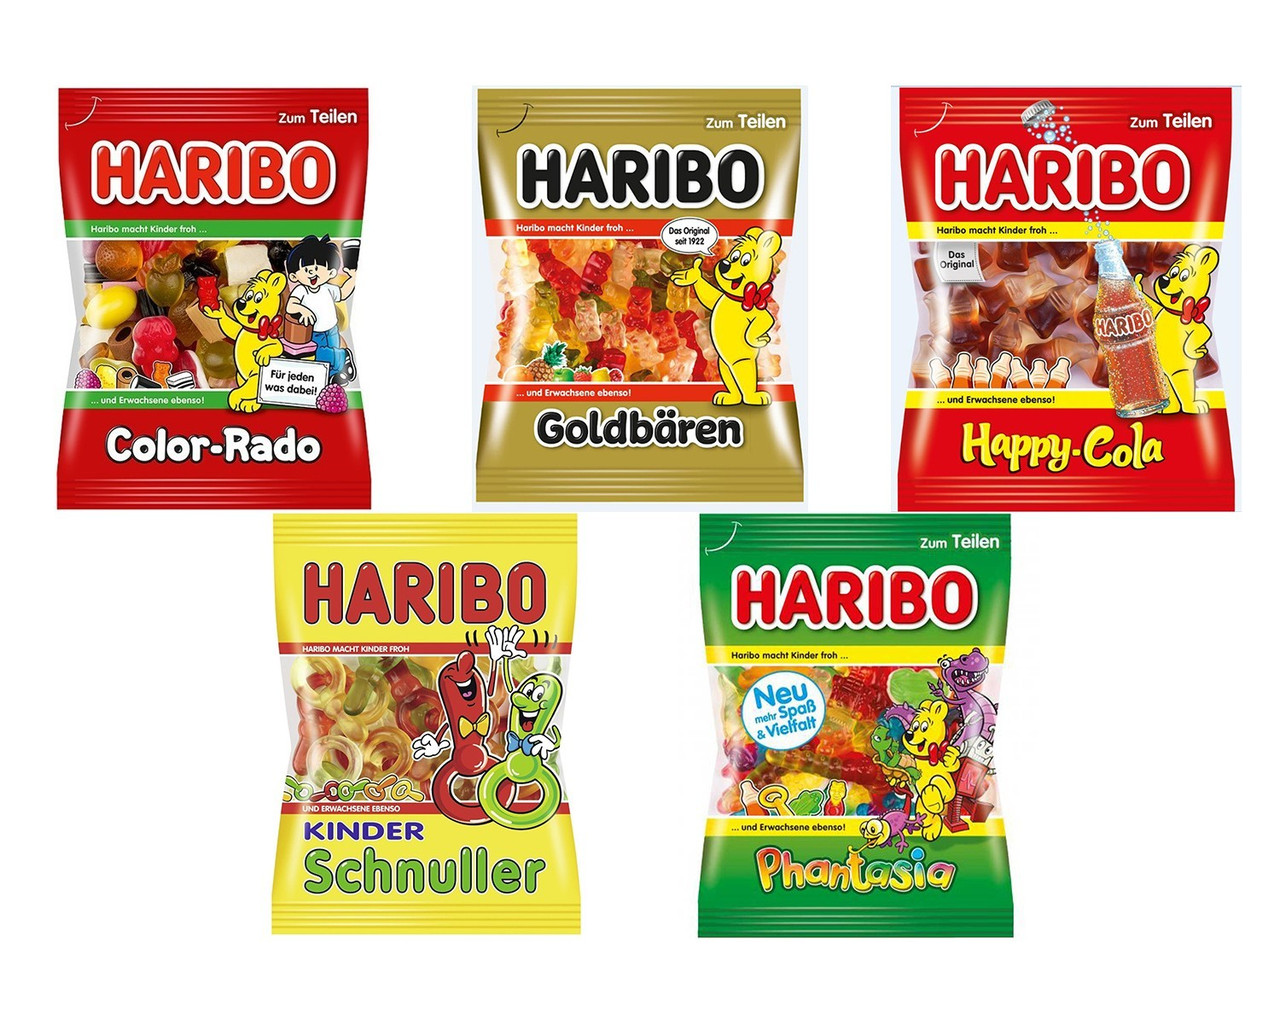 Цукерки жувальні мікс HARIBO Phantasia , Goldbären, Color-Rado, Happy-Cola, Kinder Schnuller 5 шт. * 200 грам